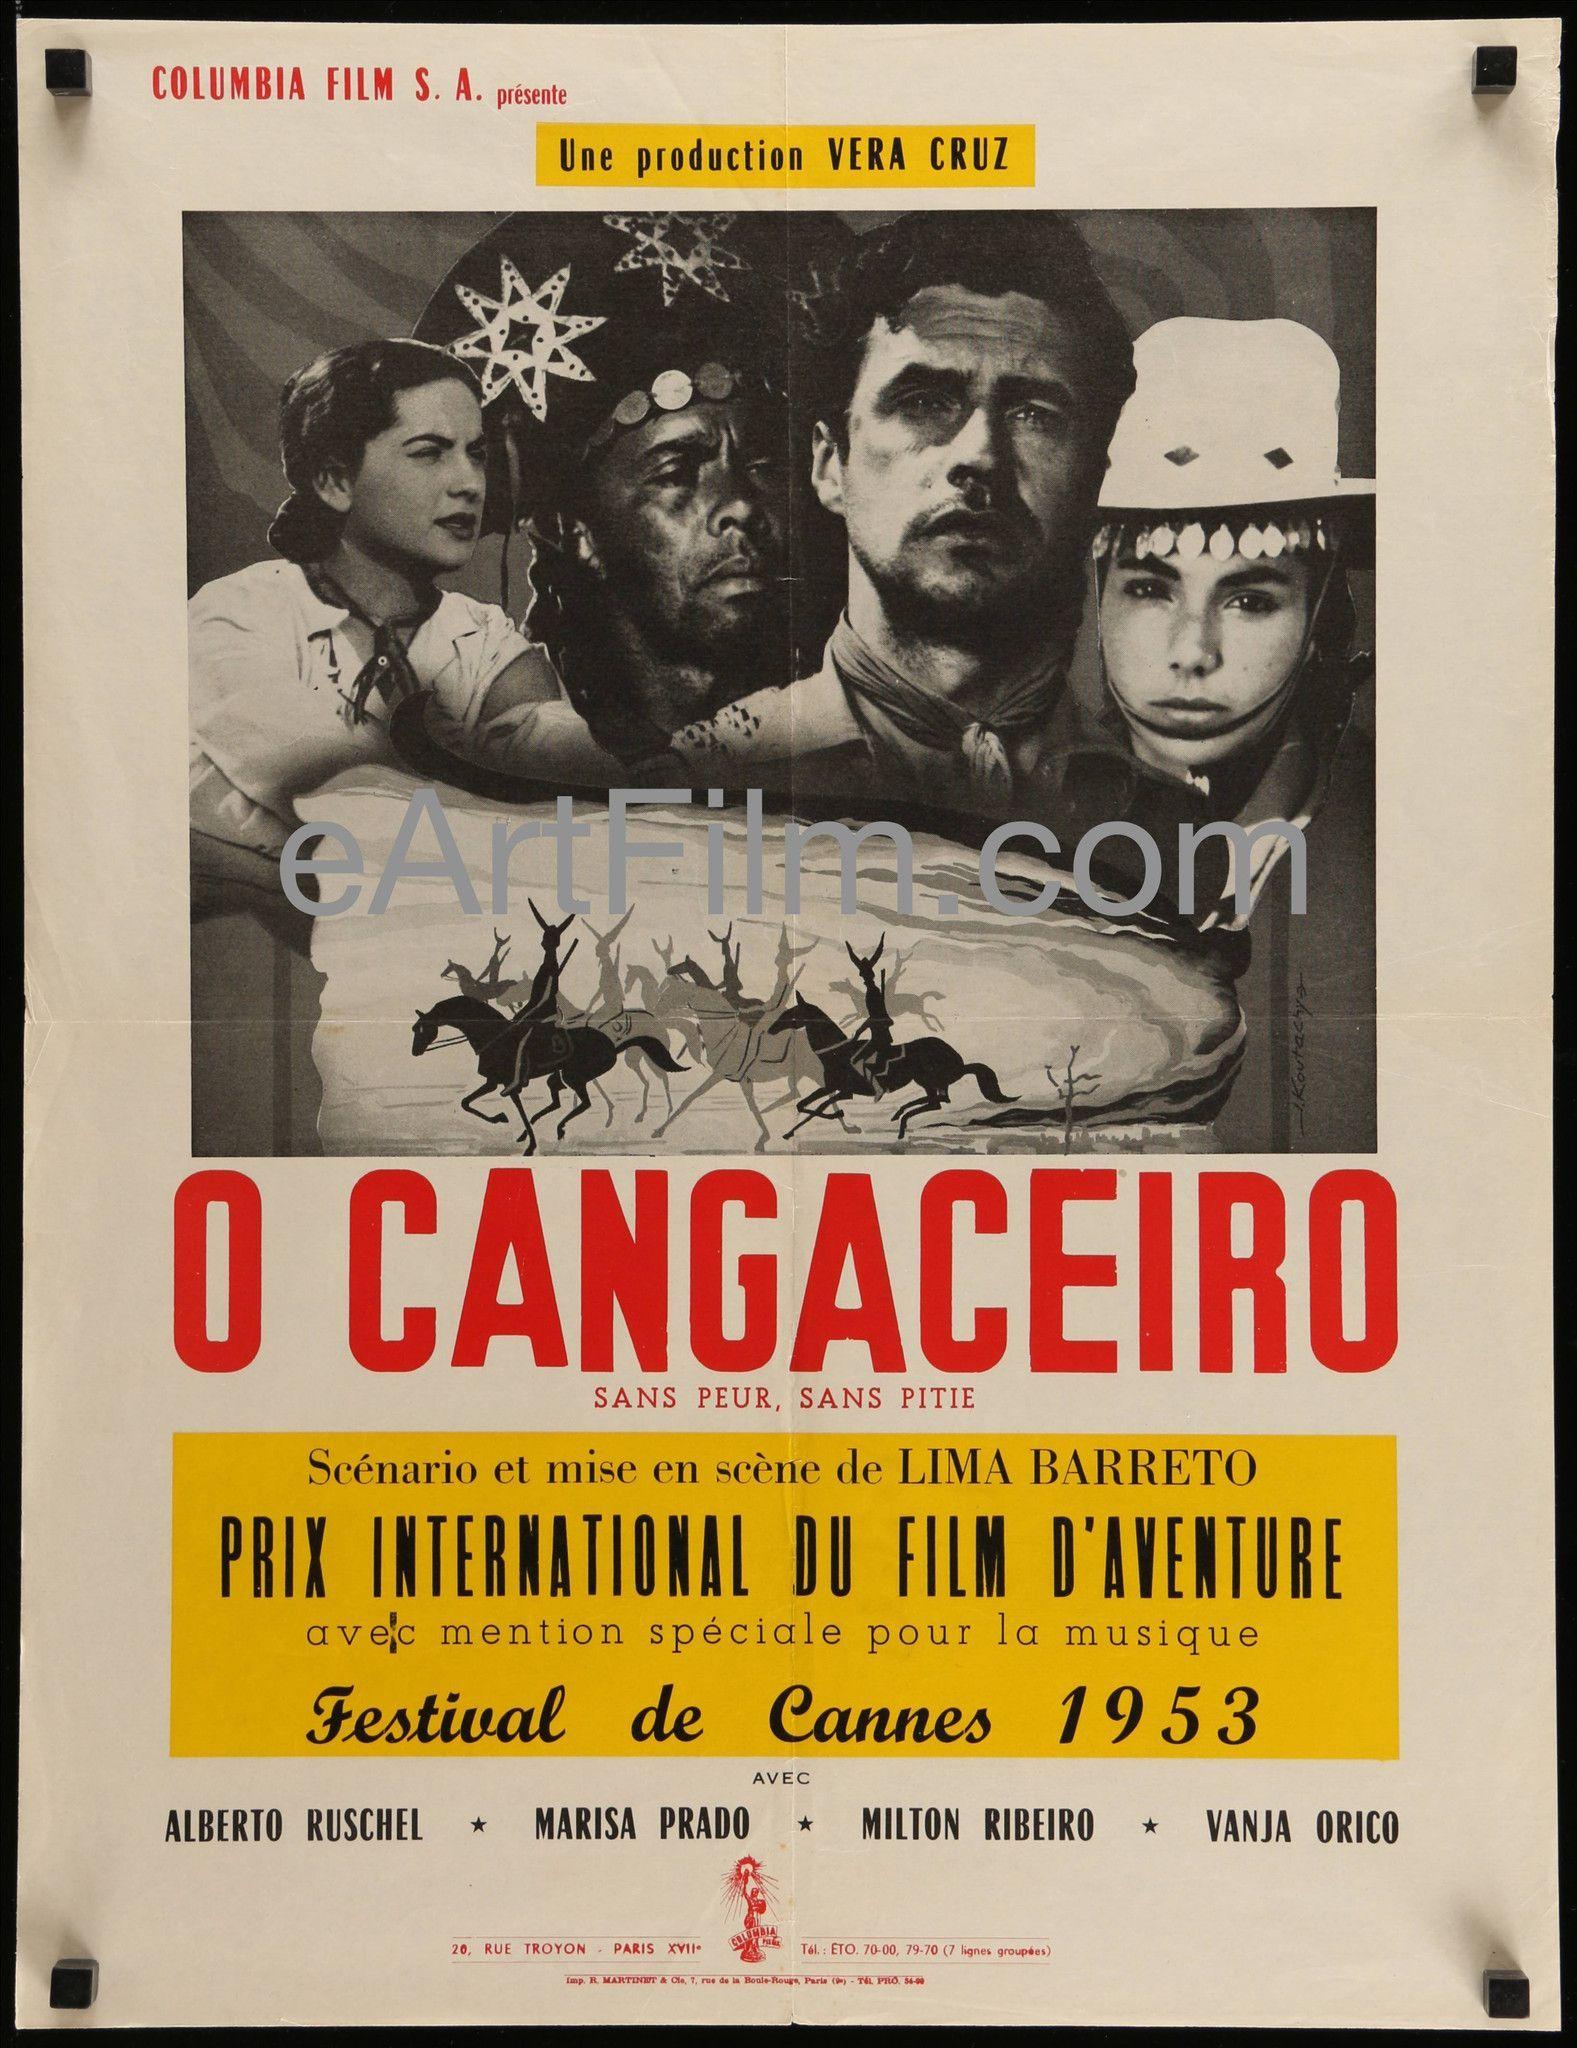 O Cangaceiro 1953 20x26 French Petite Movie Poster Cannes 1953